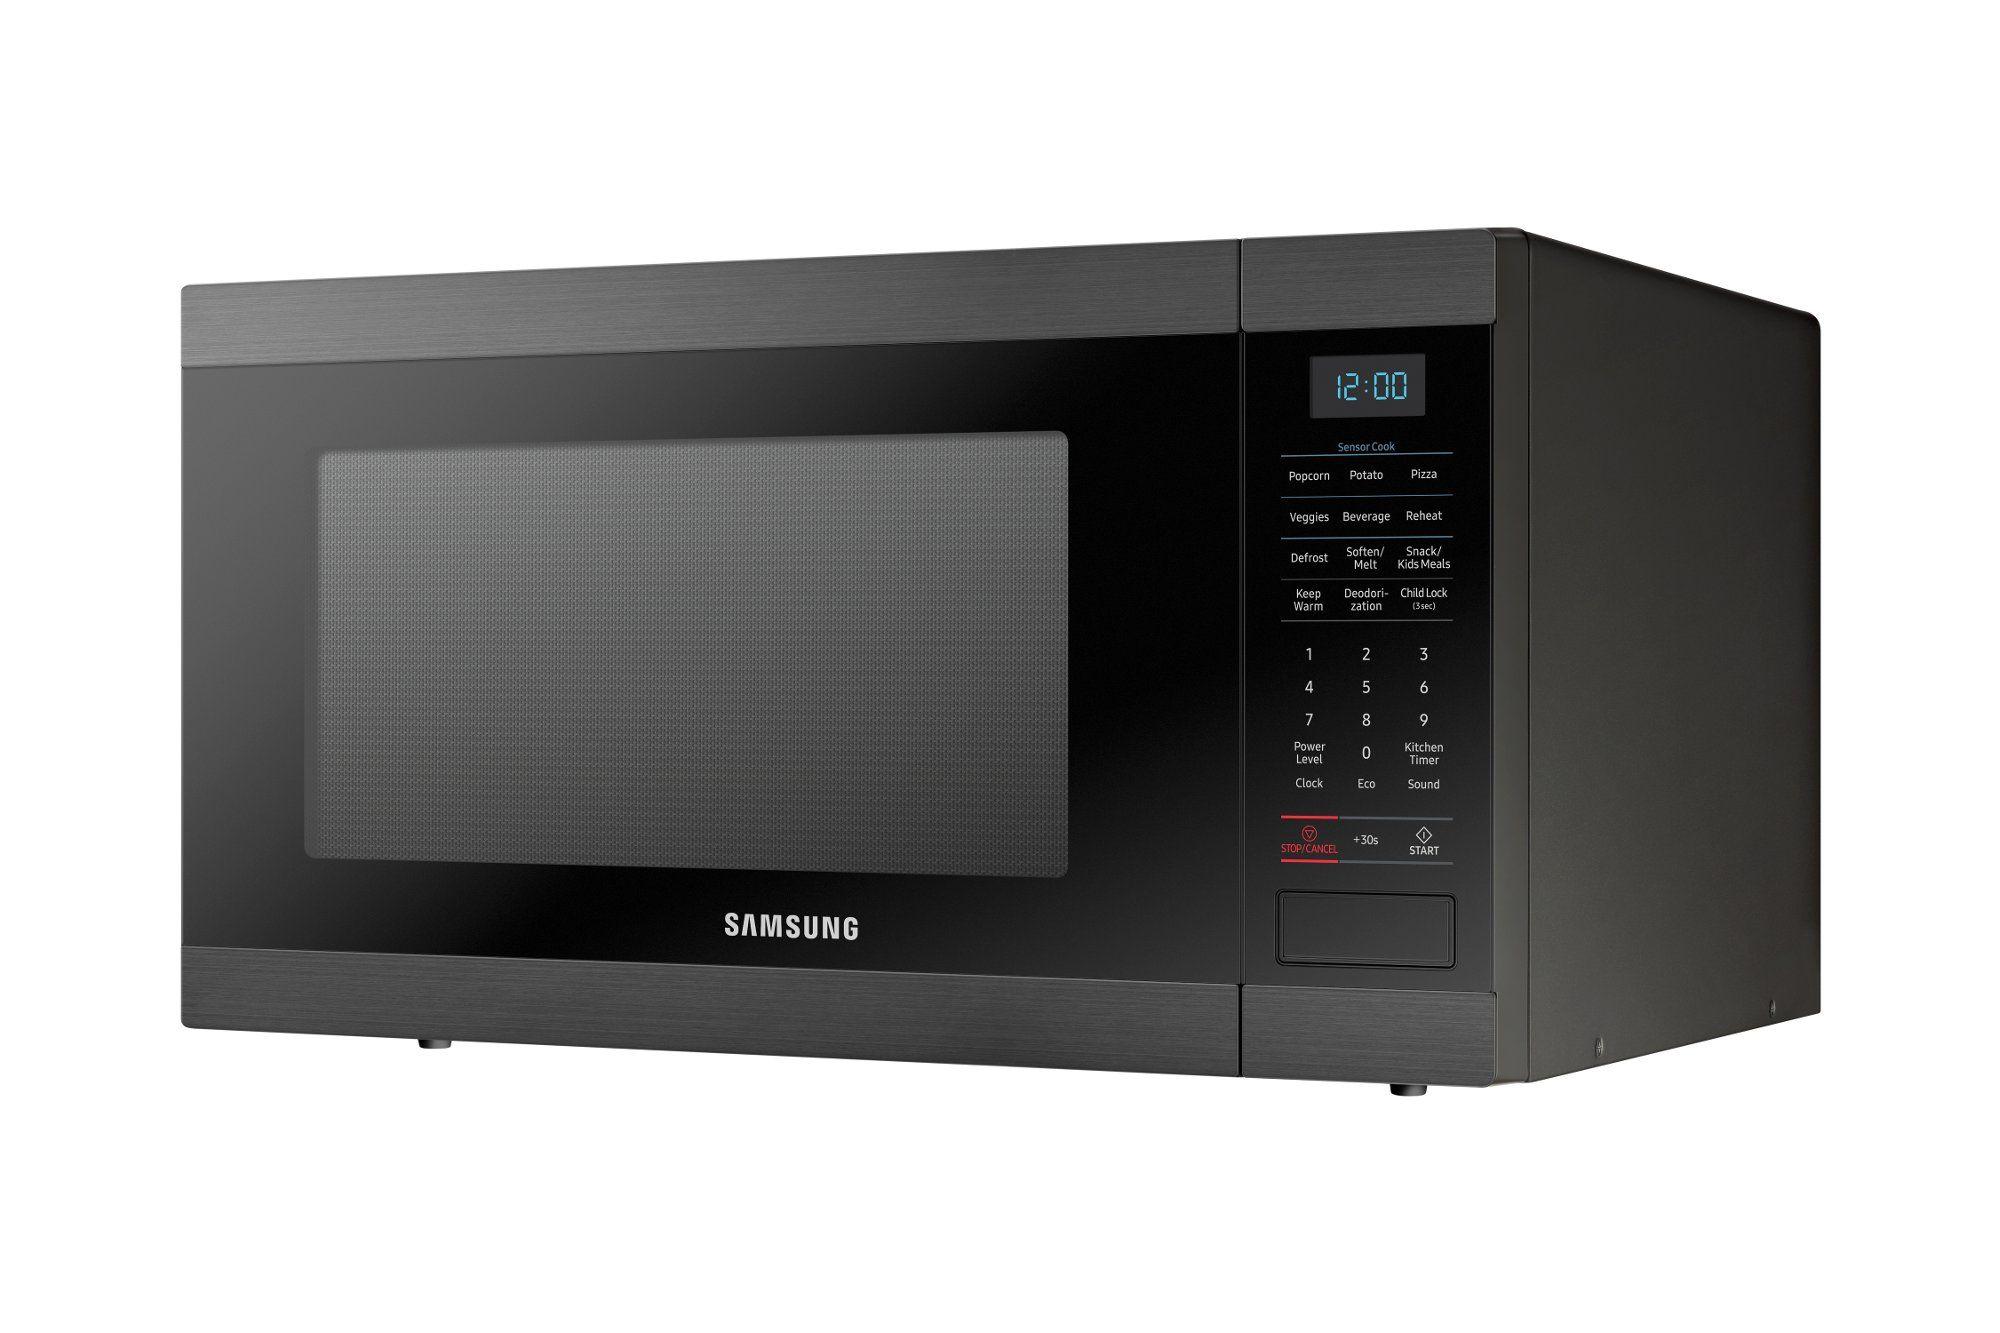 Samsung Countertop Microwave 1 9 Cu Ft Black Stainless Steel